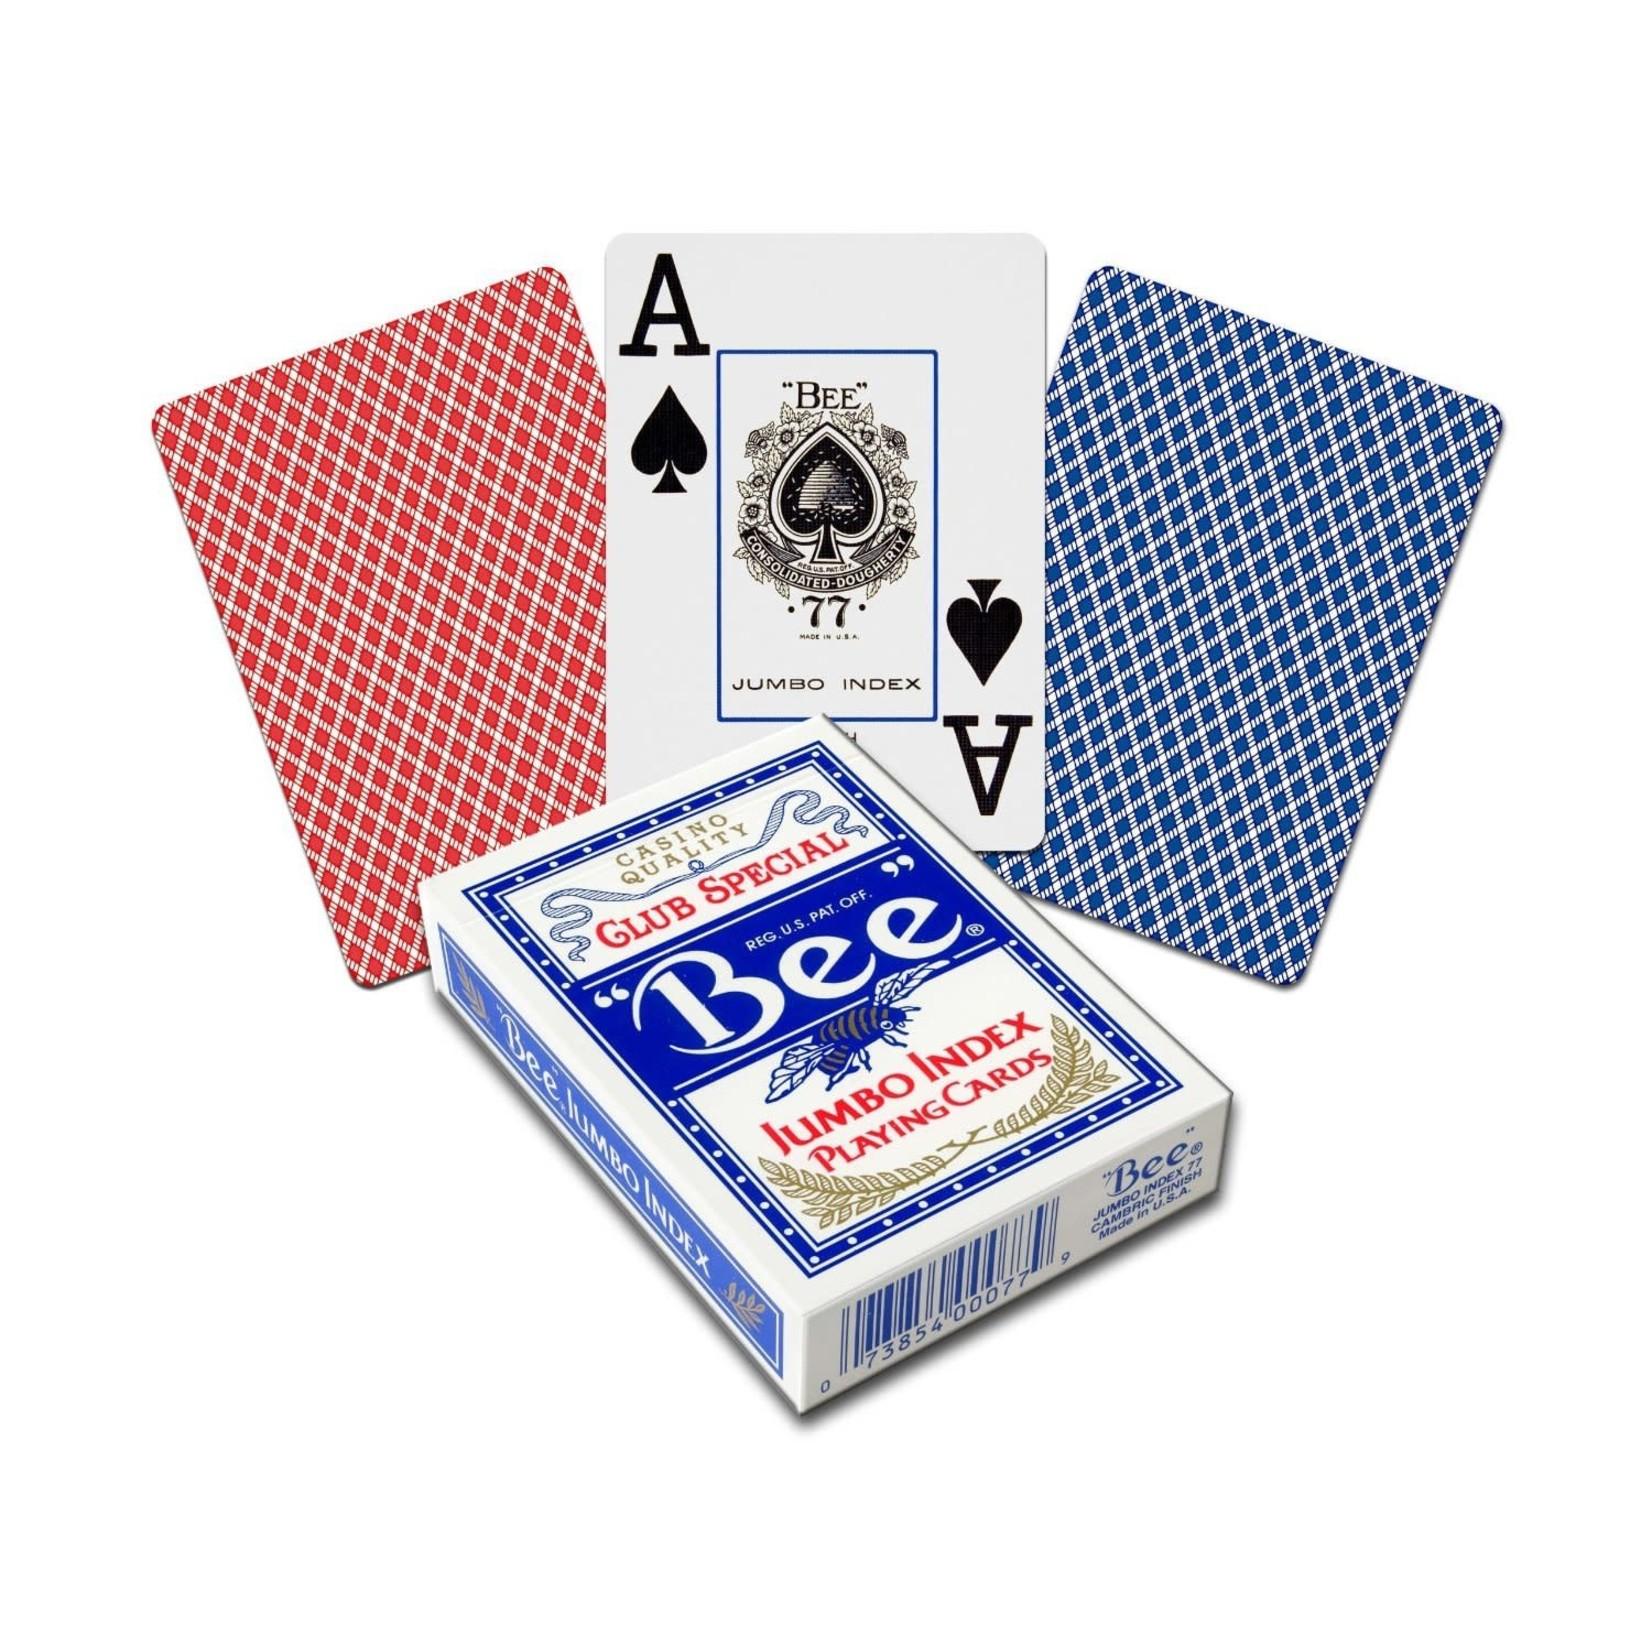 The United States Playing Card Company Bee Poker Diamond Back Jumbo Index